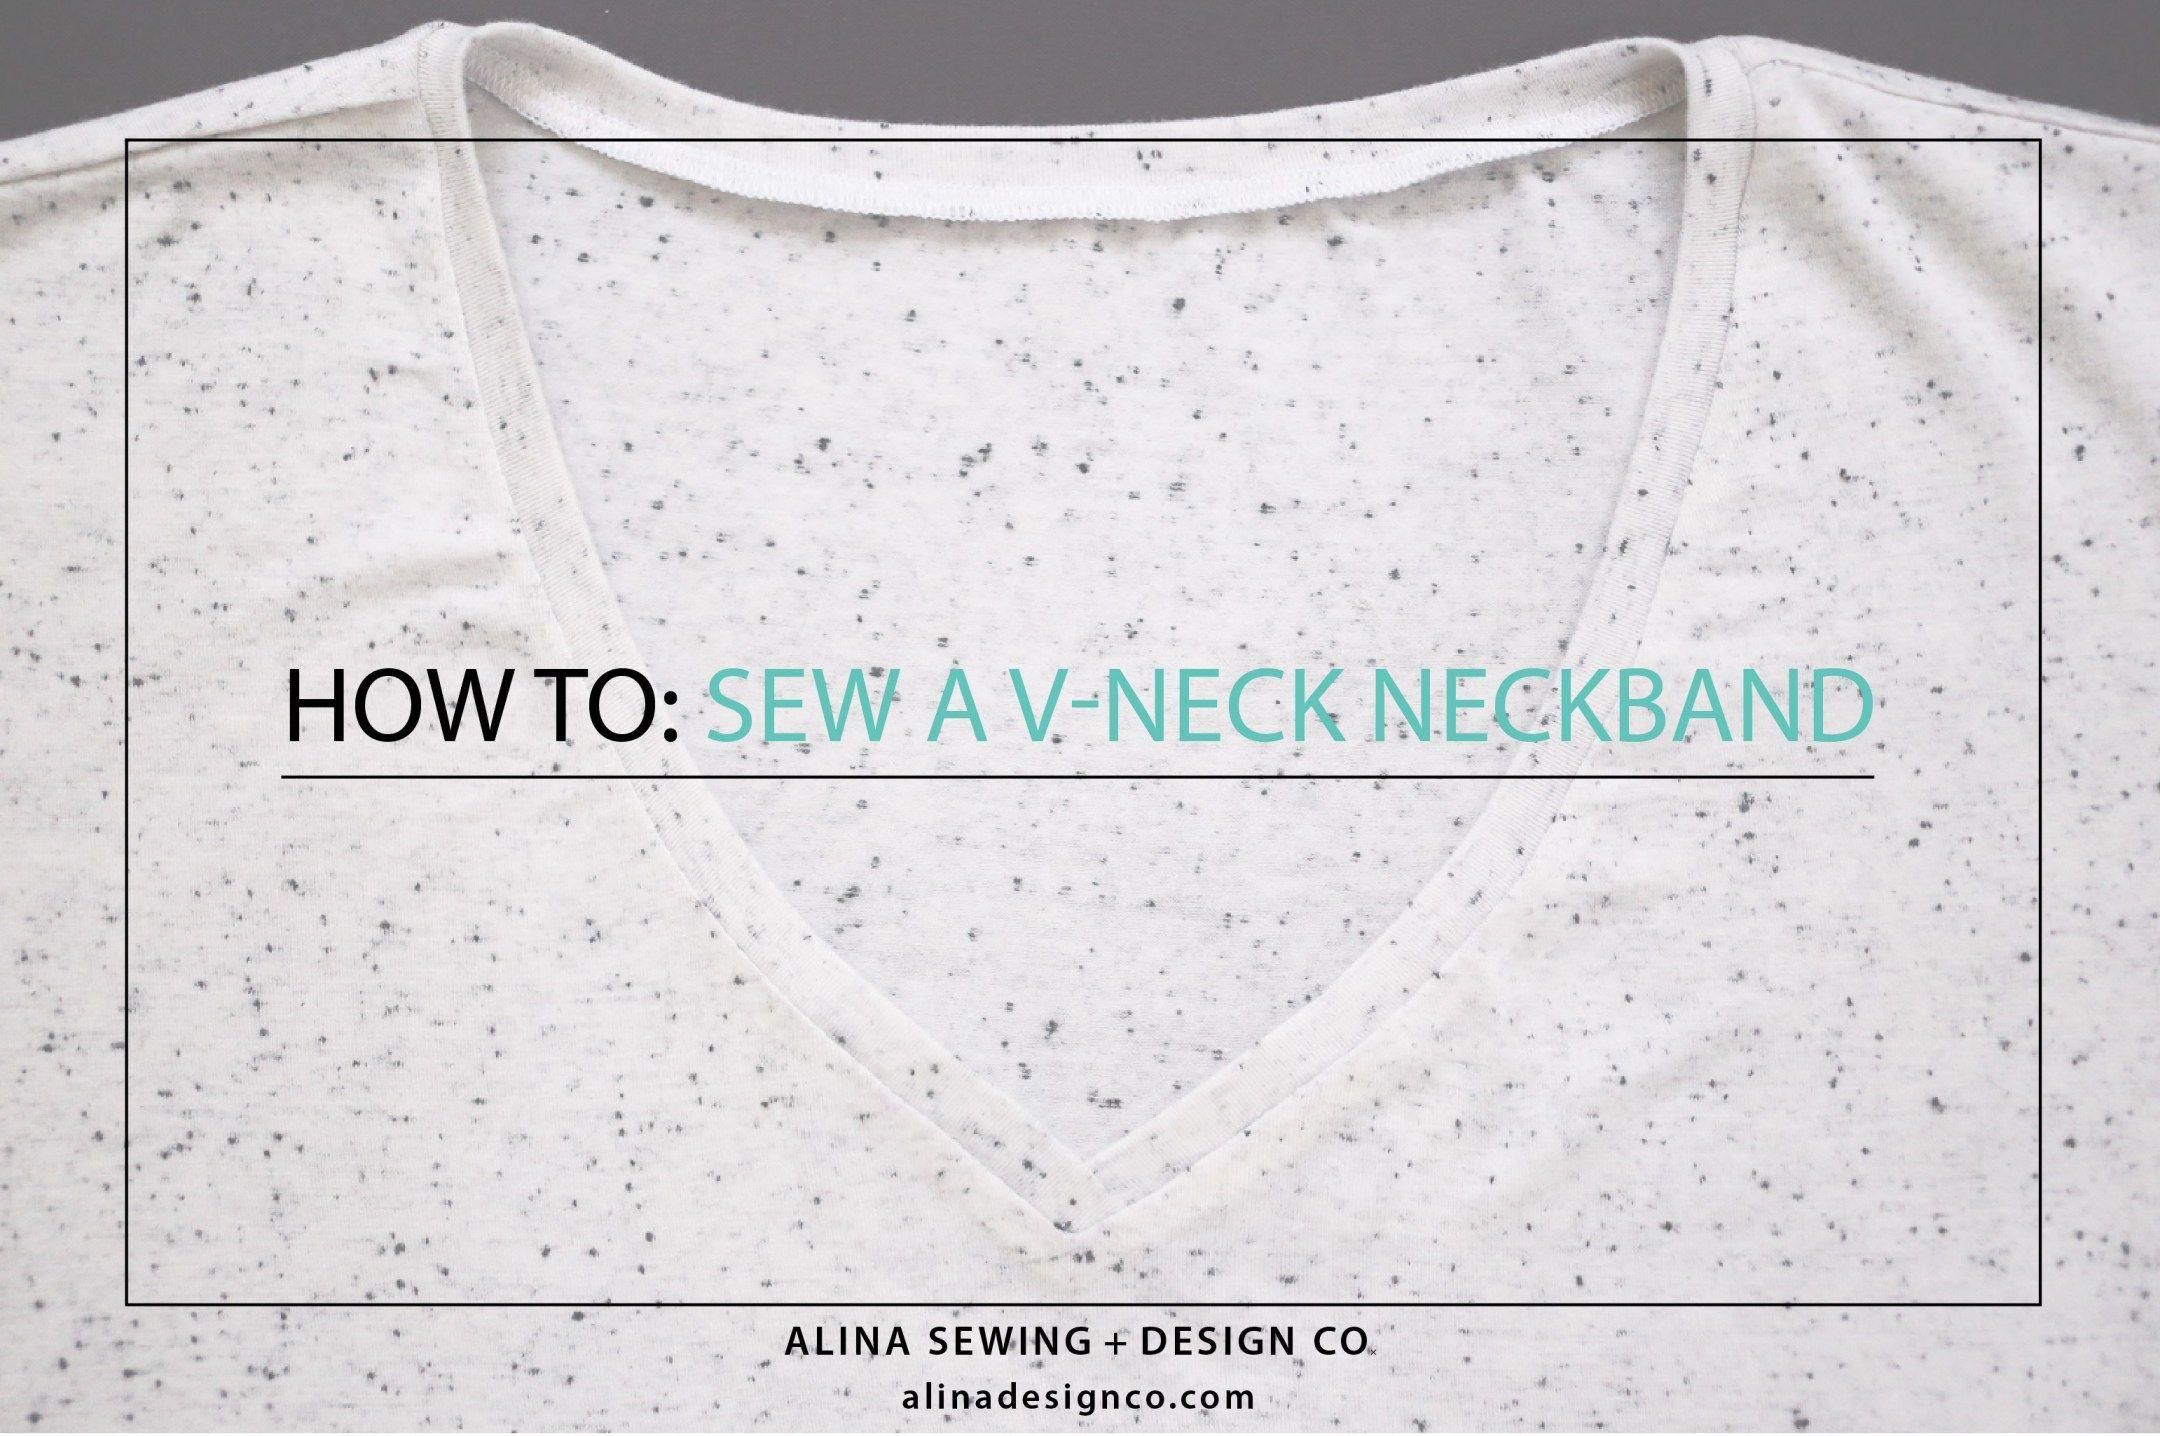 how-to-sew-a-v-neck-neckband | Cuellitos: Diy | Pinterest